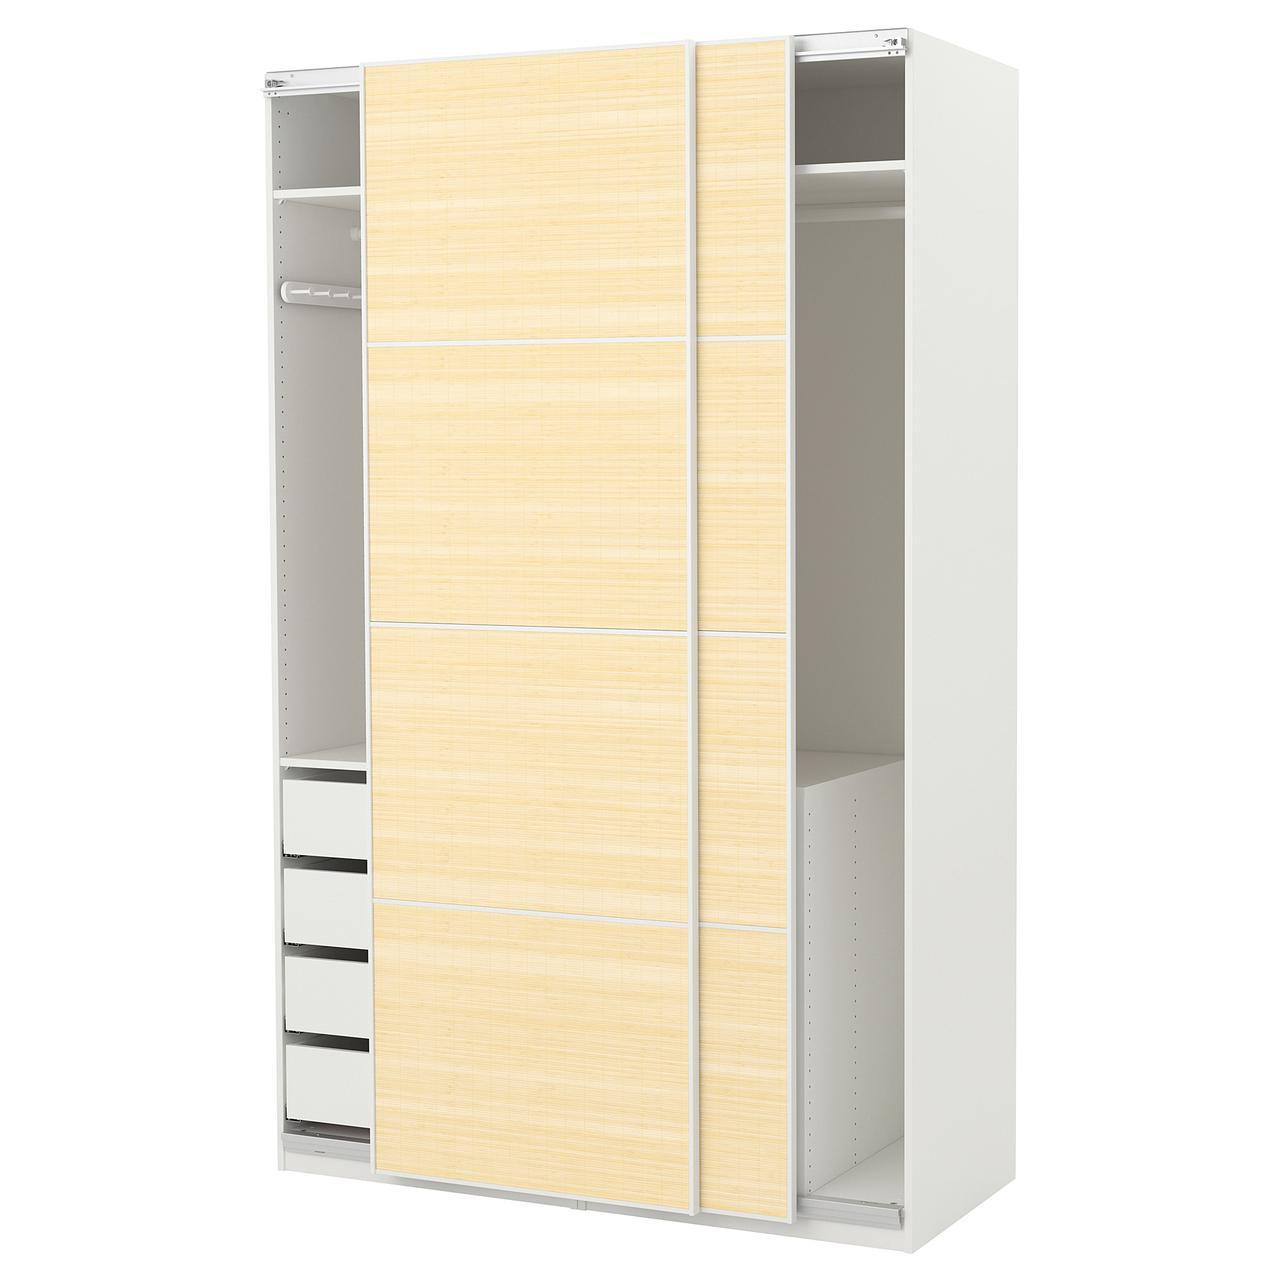 Шкаф-купе IKEA PAX 150x66x236 см Fjellhamar белый светлый бамбук 592.433.32